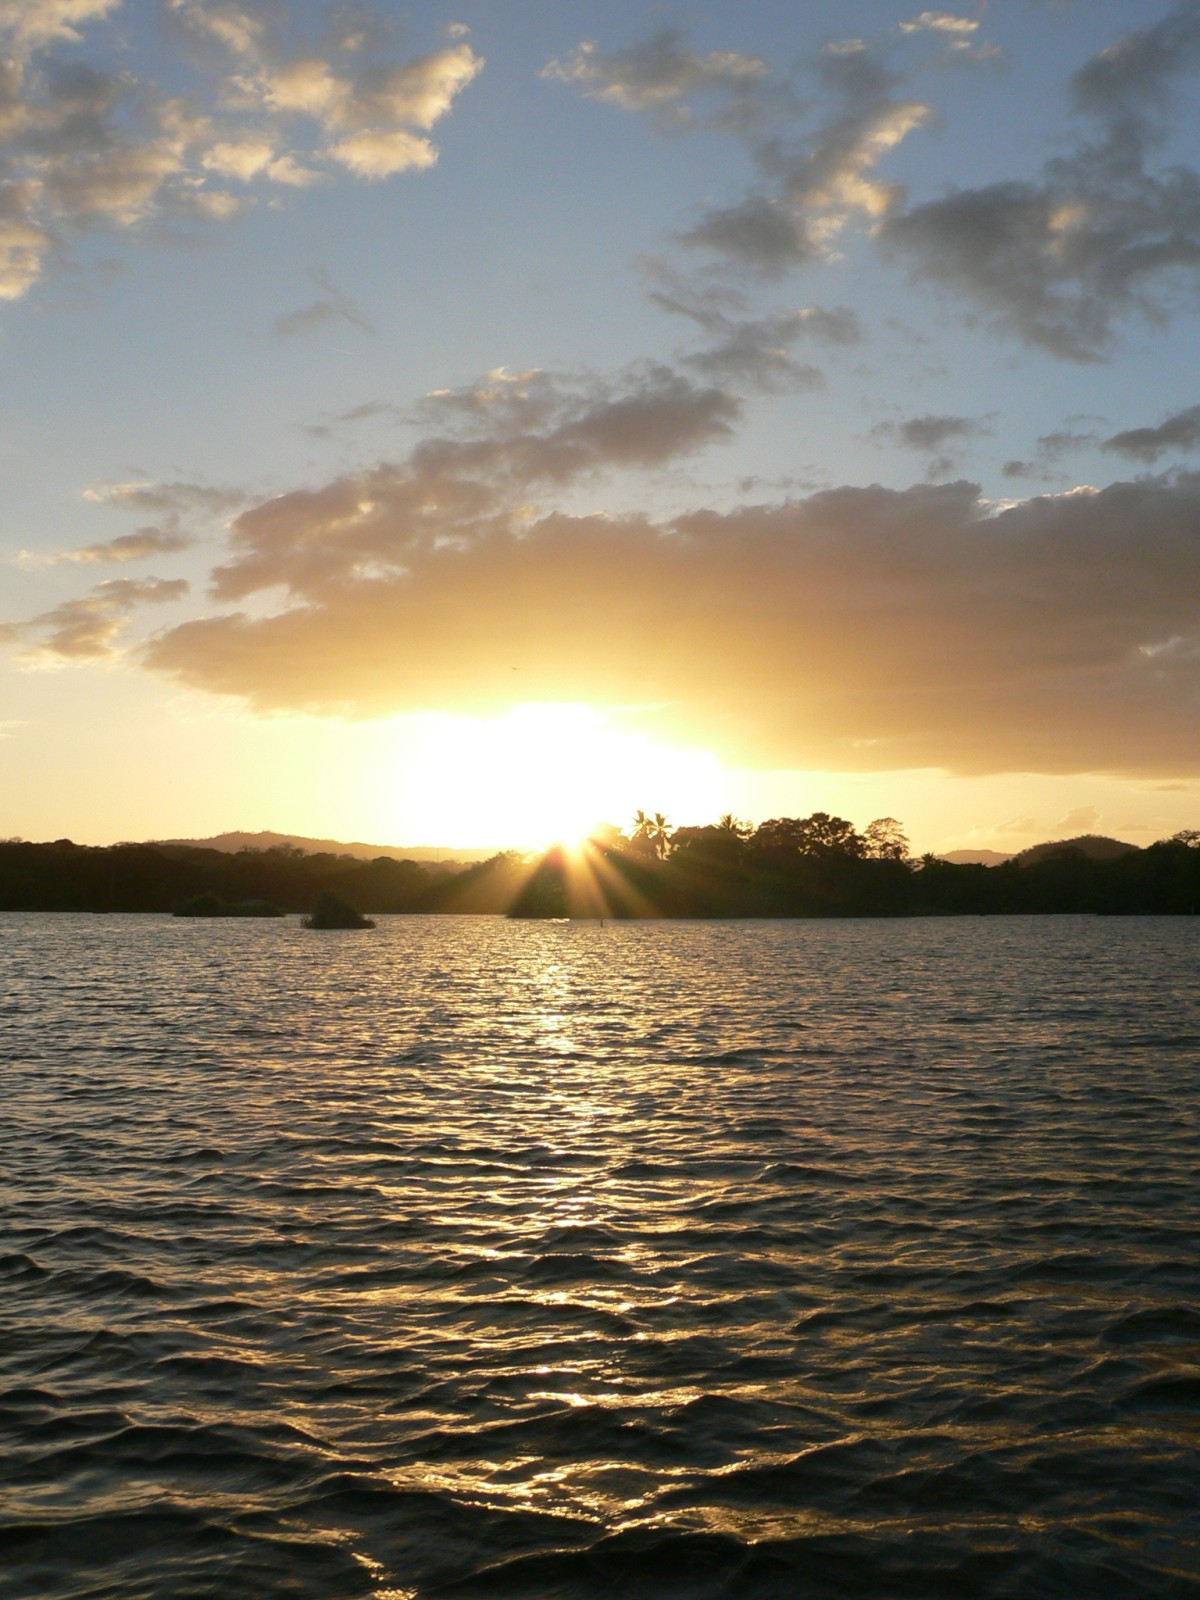 nic06-sunset-boat-ride-on-lake-nicaragua-free-ra